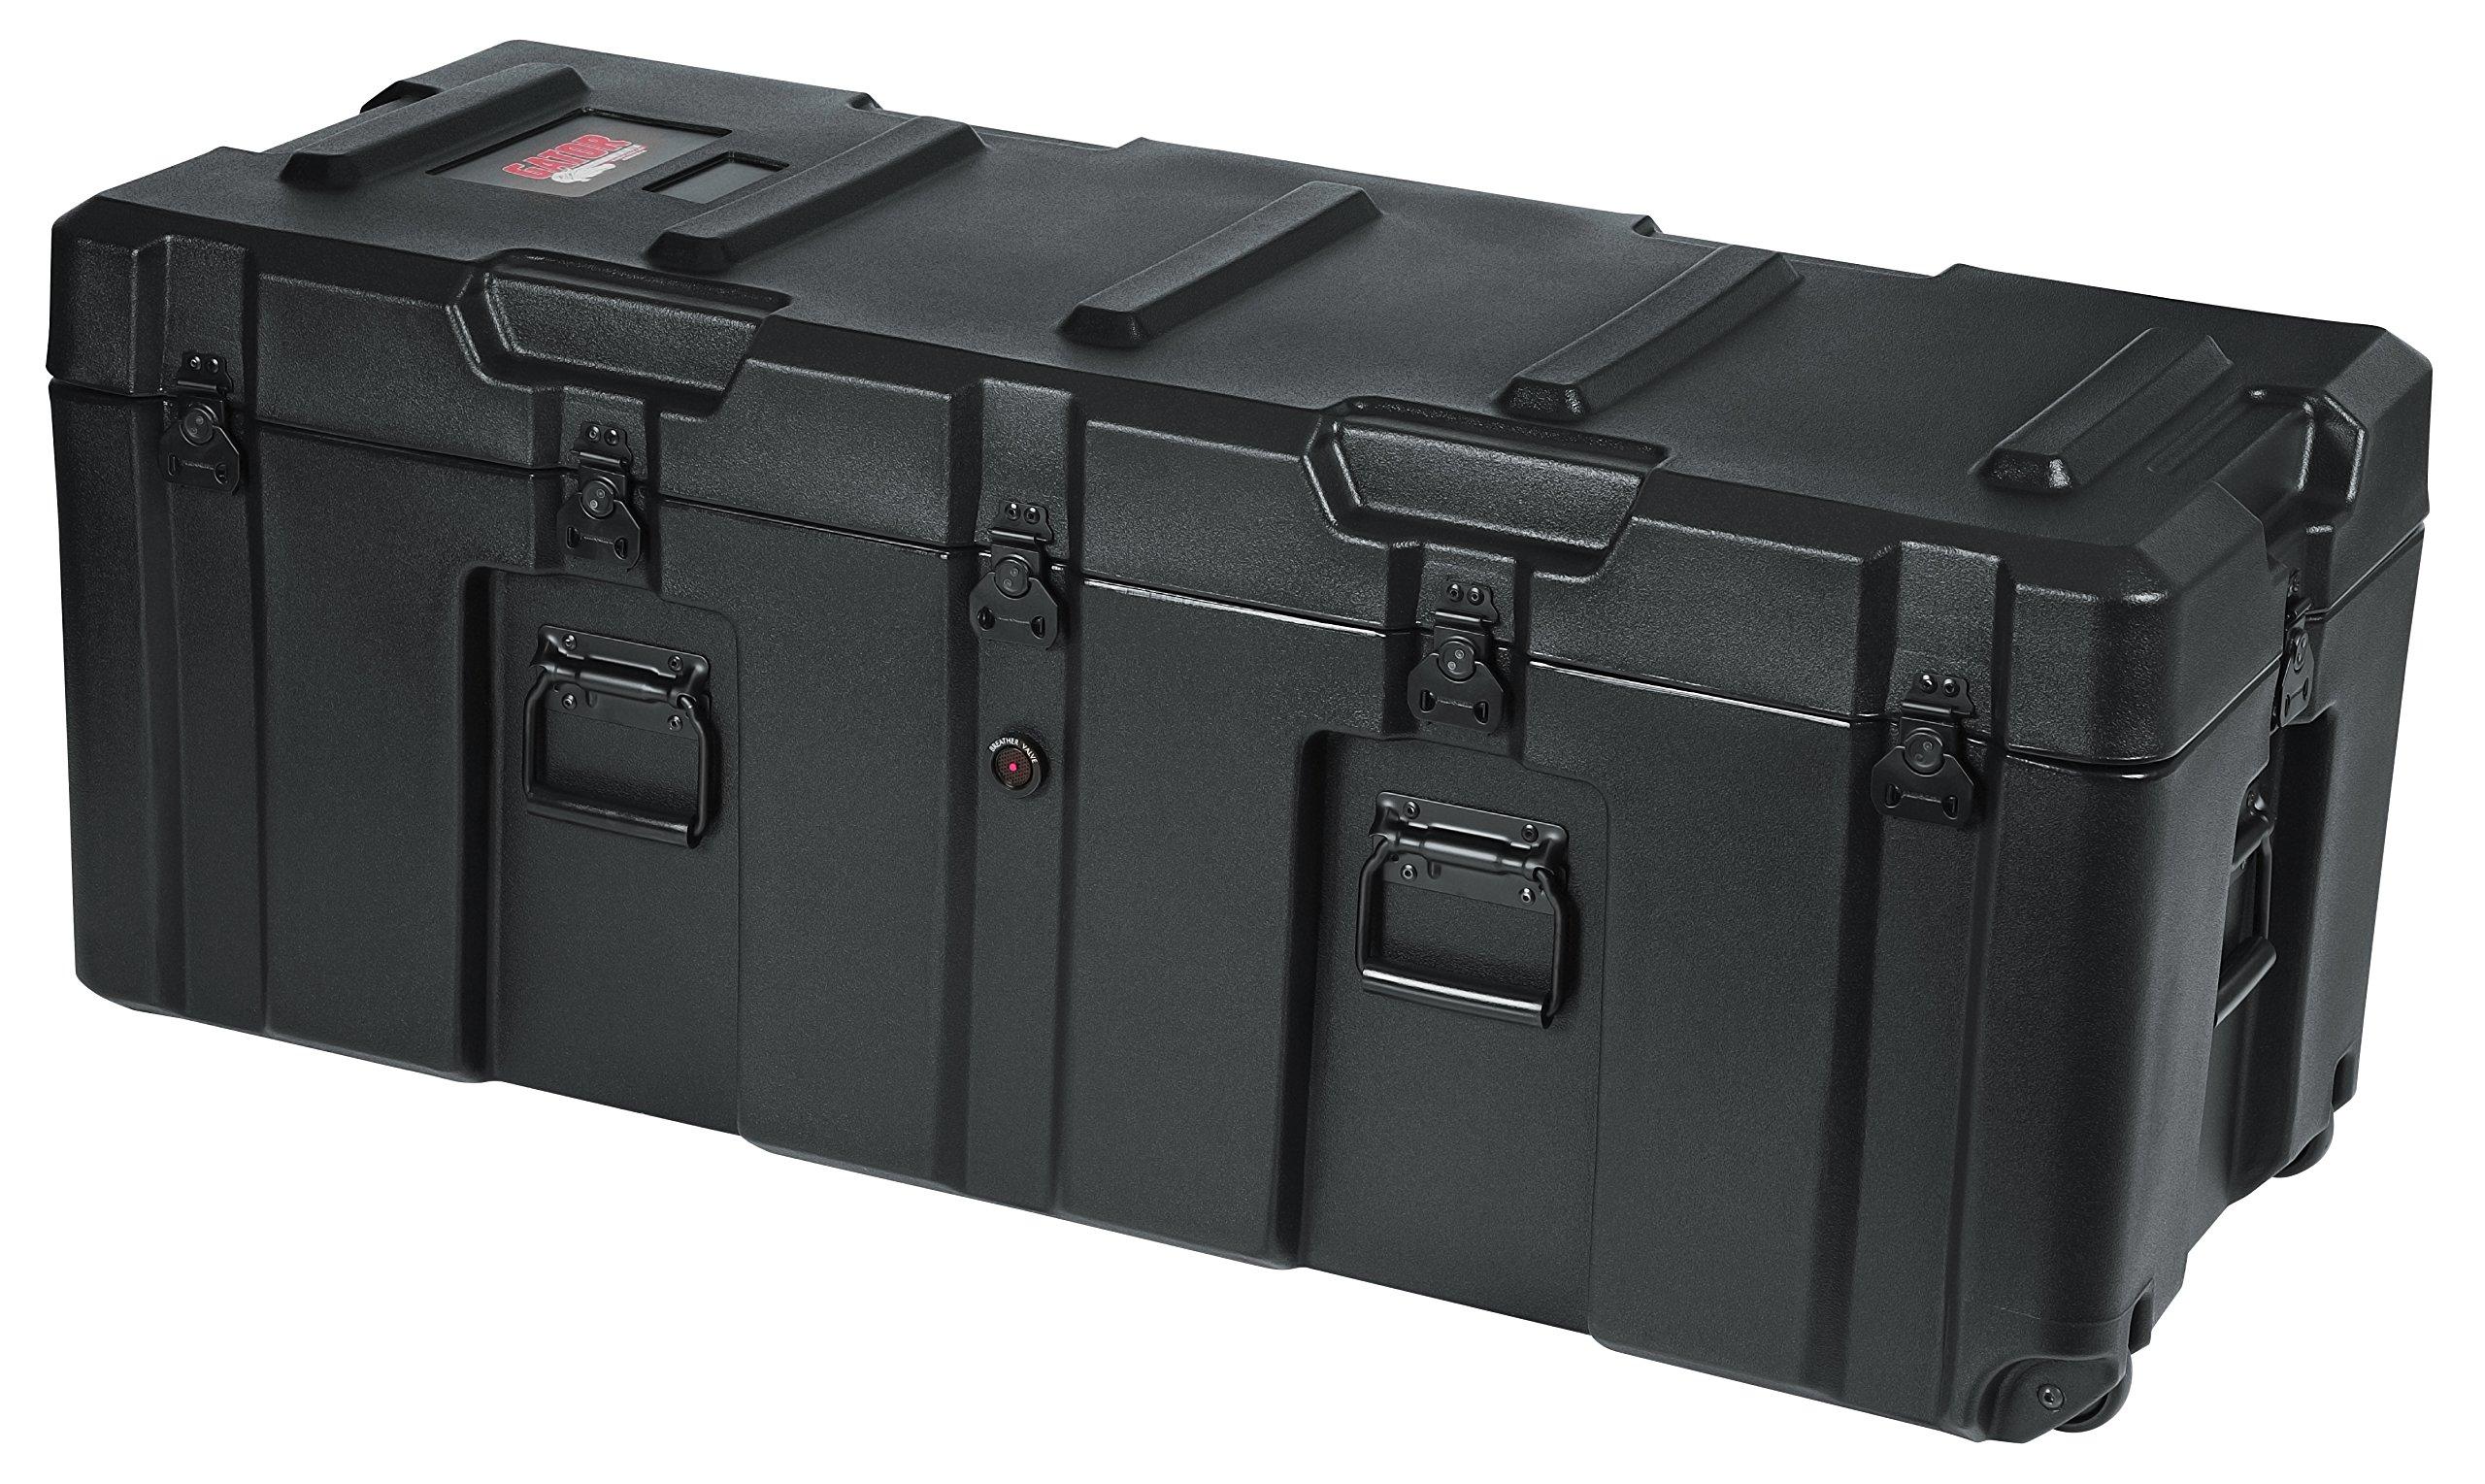 Gator Cases ATA Roto-Molded Utility Equipment Case; 45'' x 17'' x 18'' Interior (GXR-4517-1503)